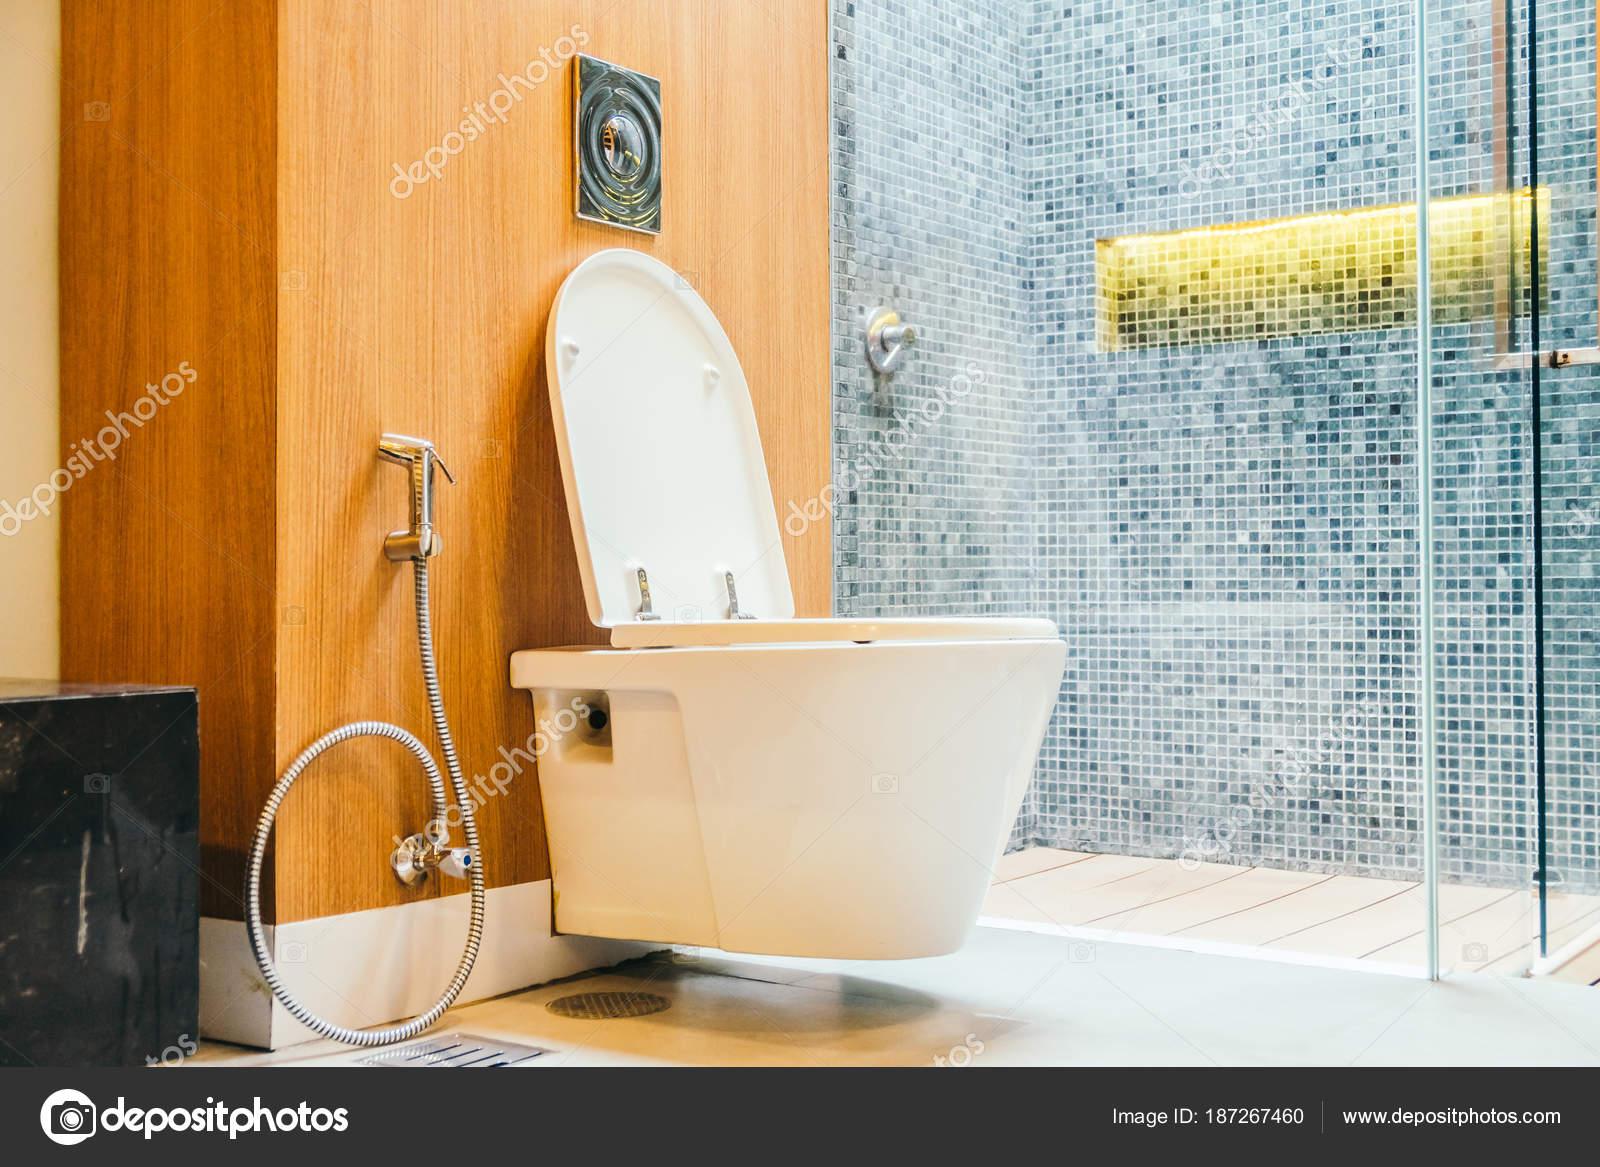 Witte wc bril voor kom u2014 stockfoto © mrsiraphol #187267460